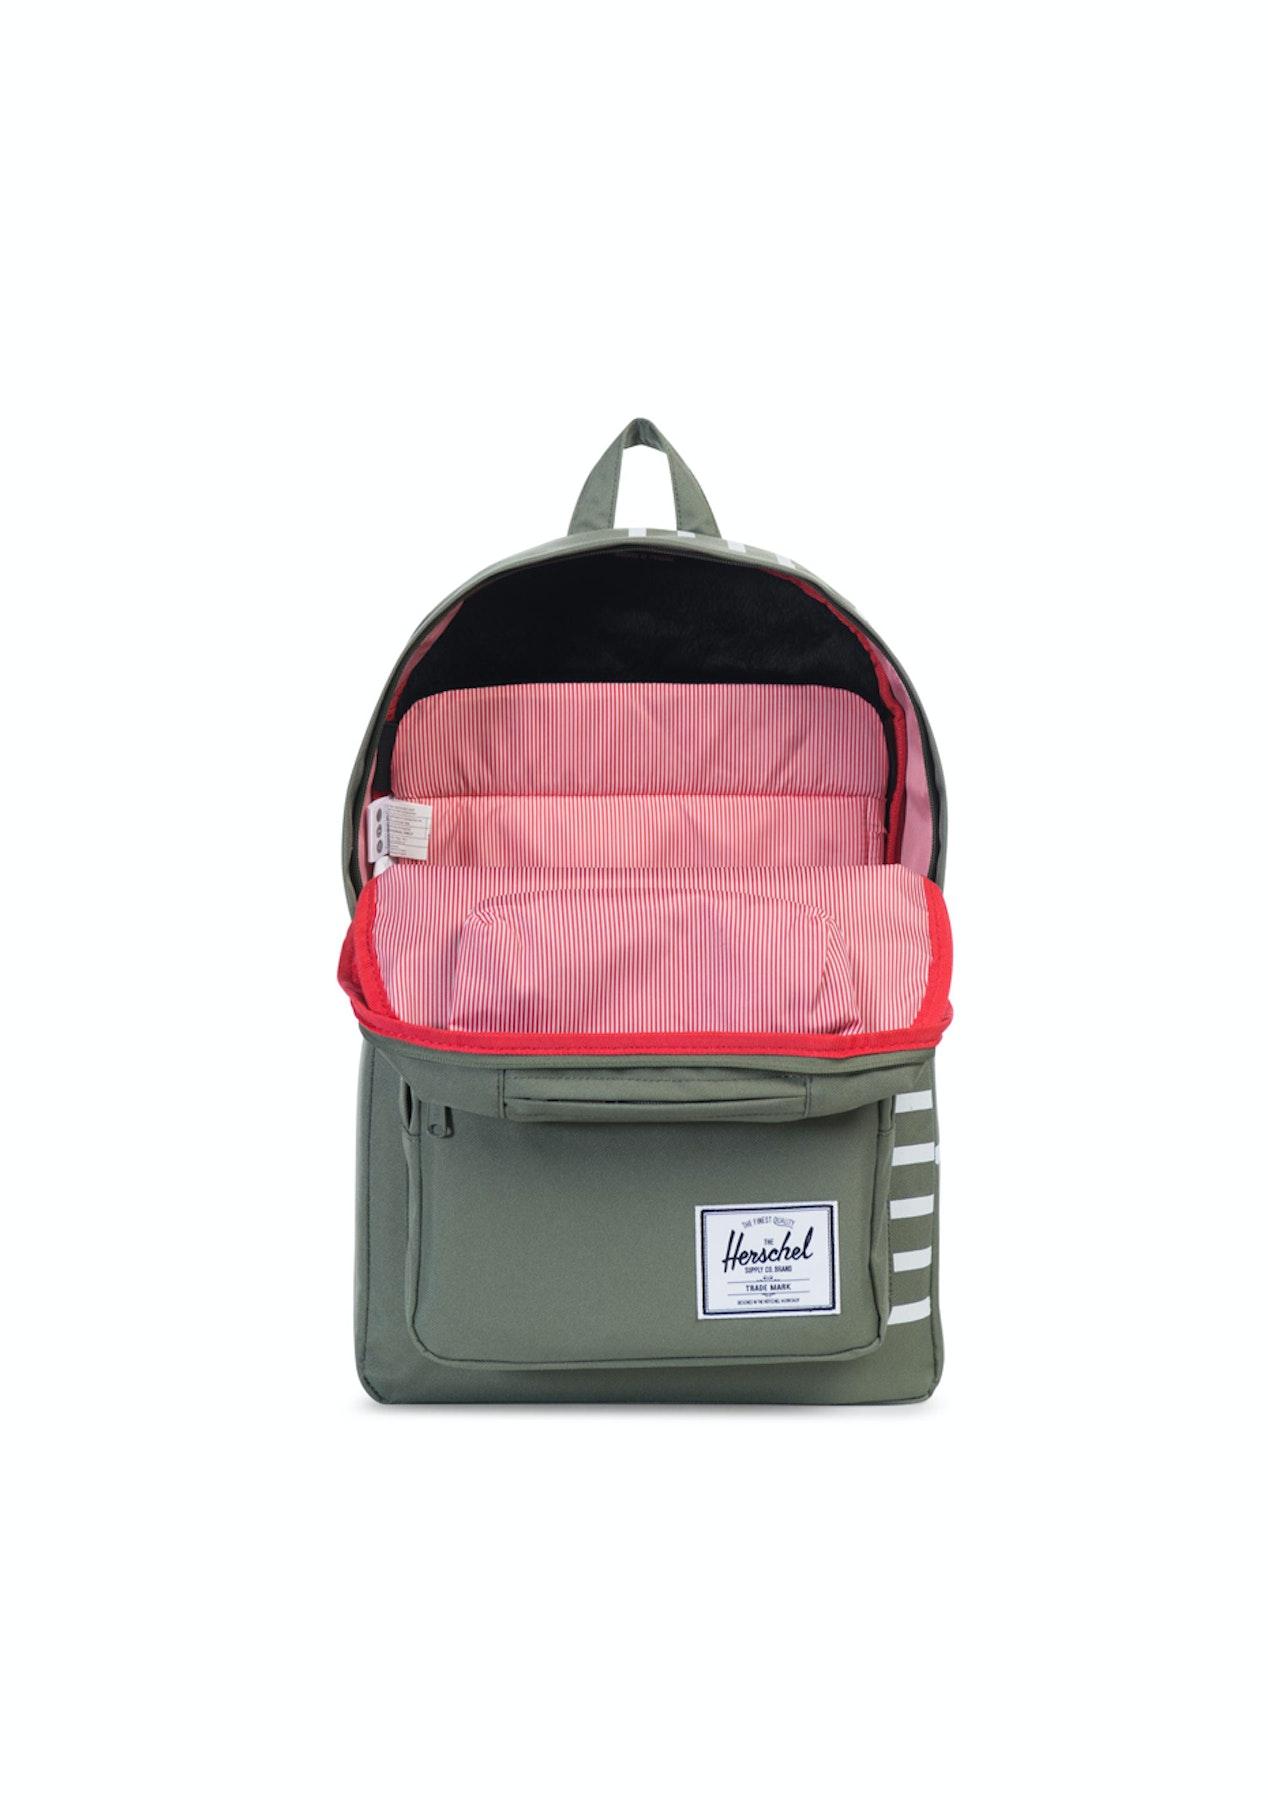 Herschel Supply Co - Pop Quiz - Deep Lichen Green Blanc de Blanc Stripes -  Mens Streetwear Sale - Onceit ceb31913d8